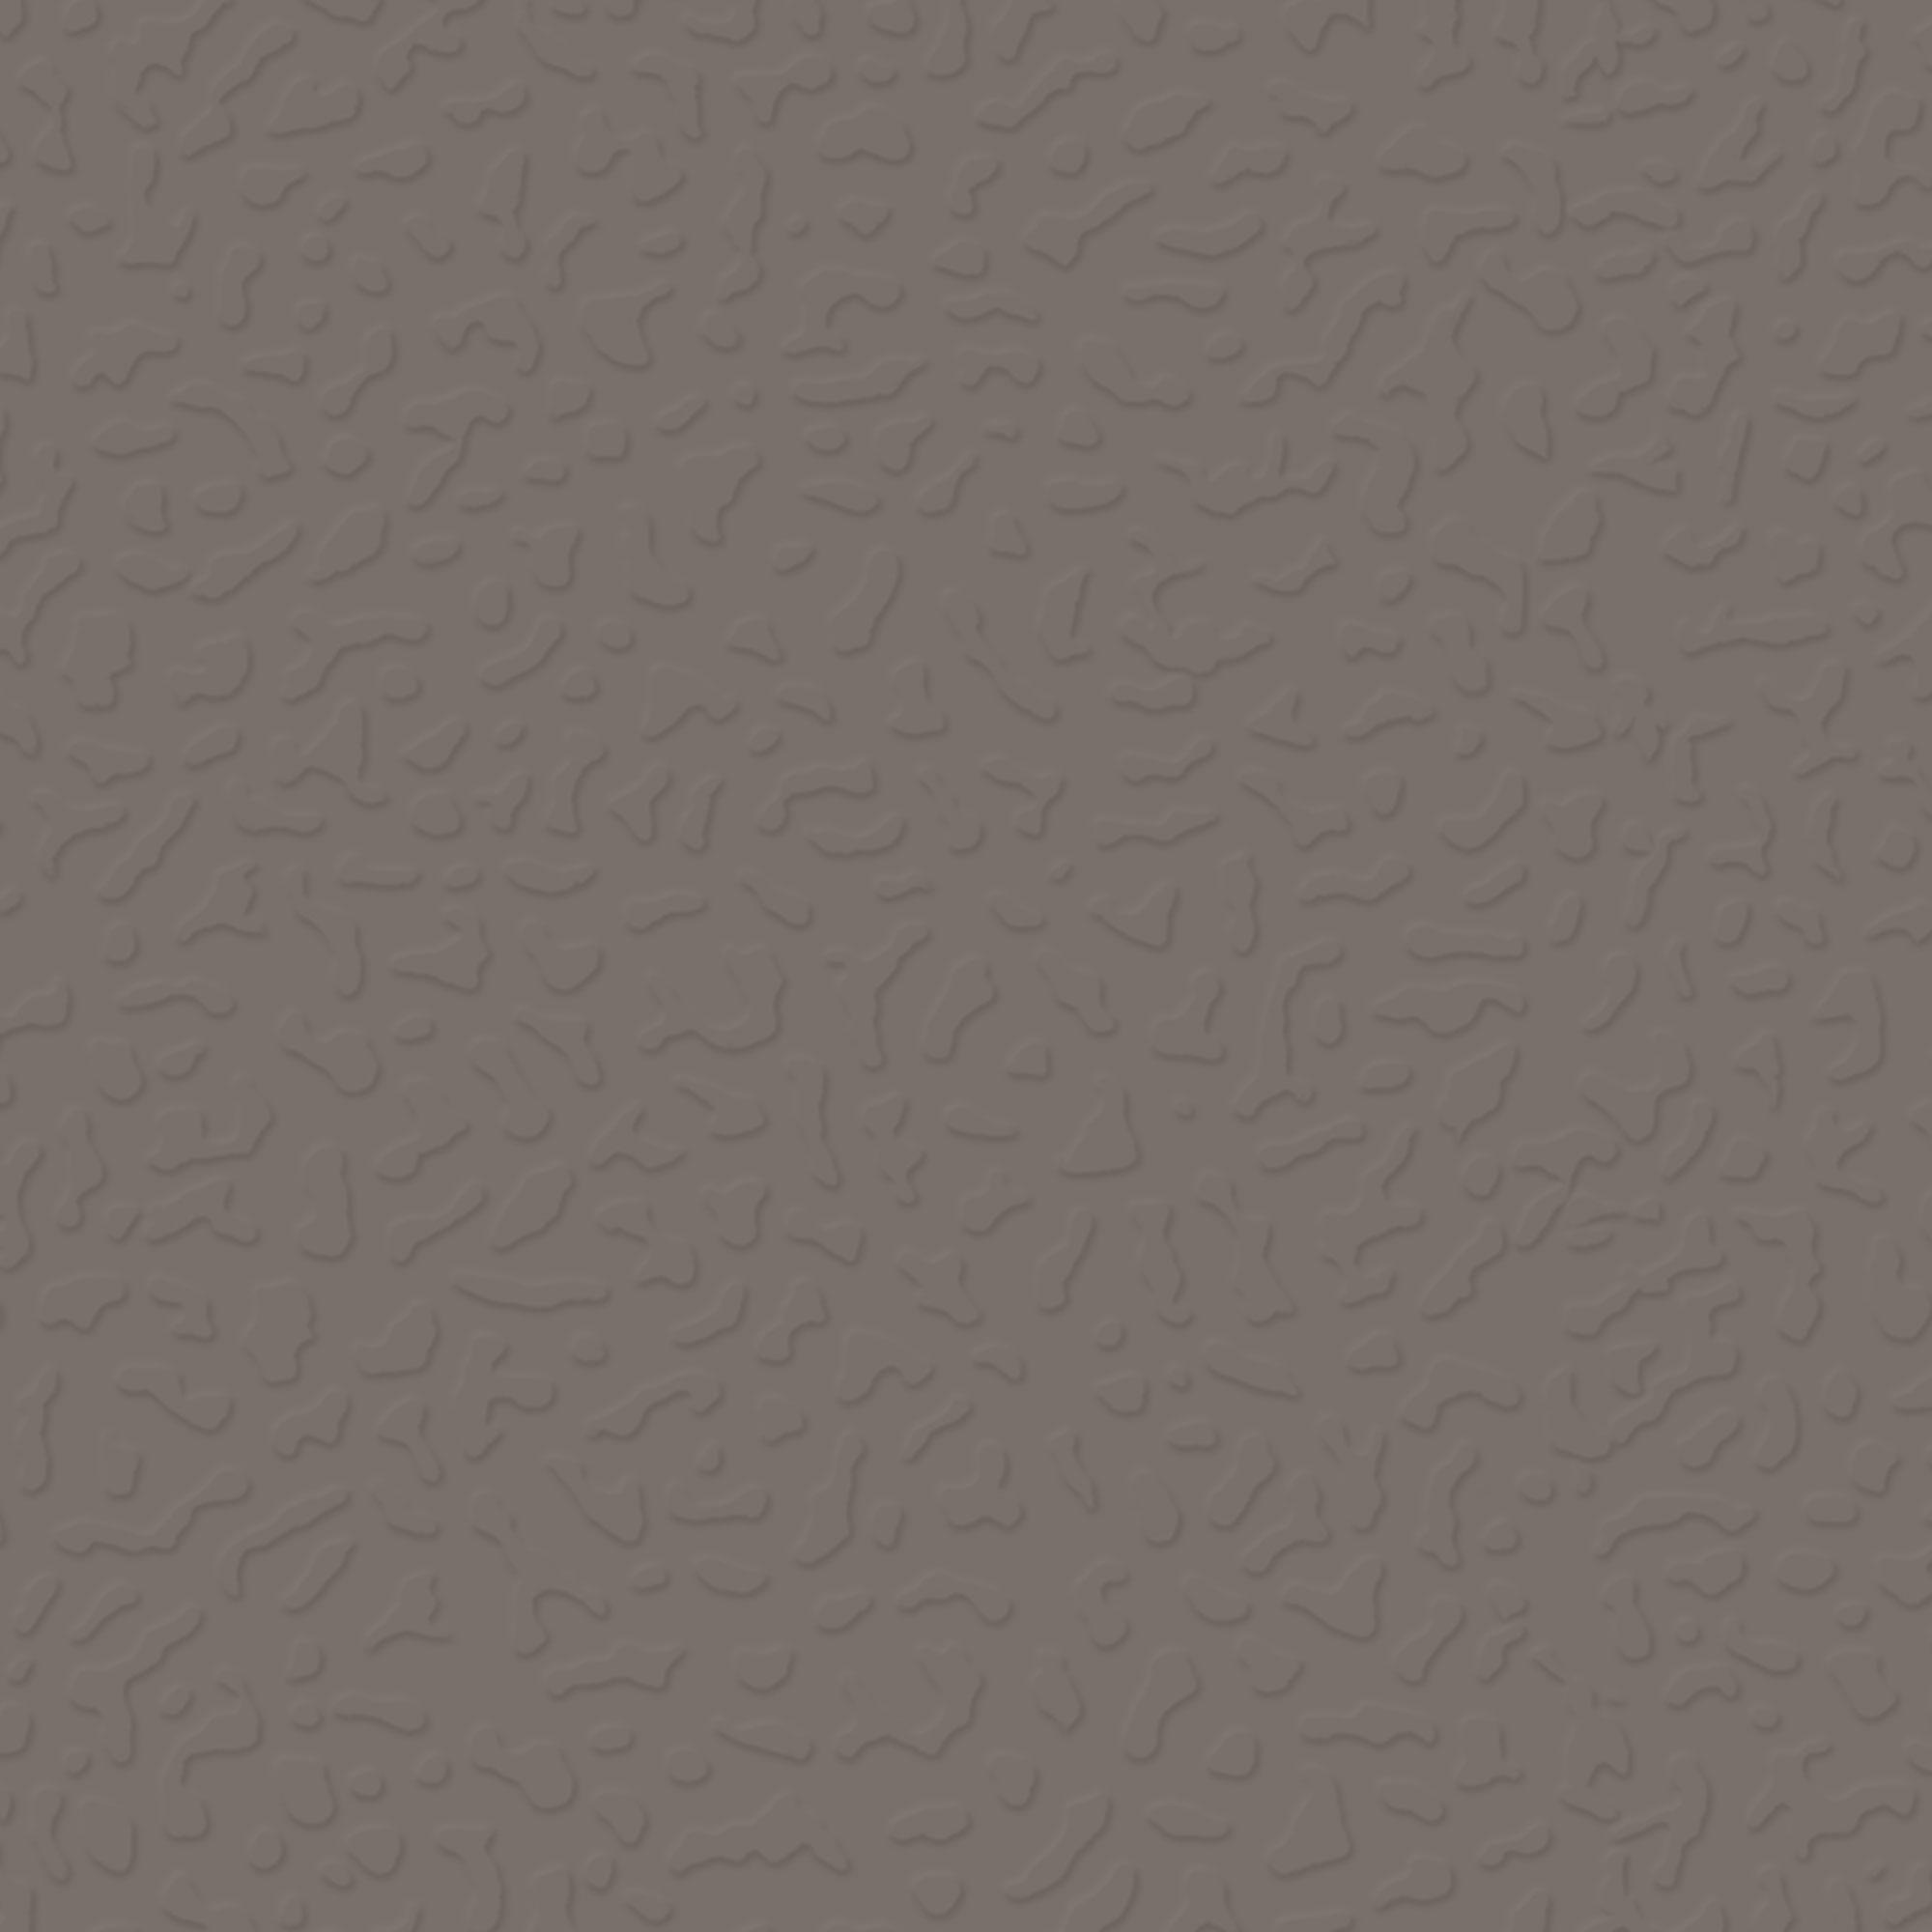 Roppe Rubber Tile 900 - Textured Design (993) Lunar Dust Rubber Flooring